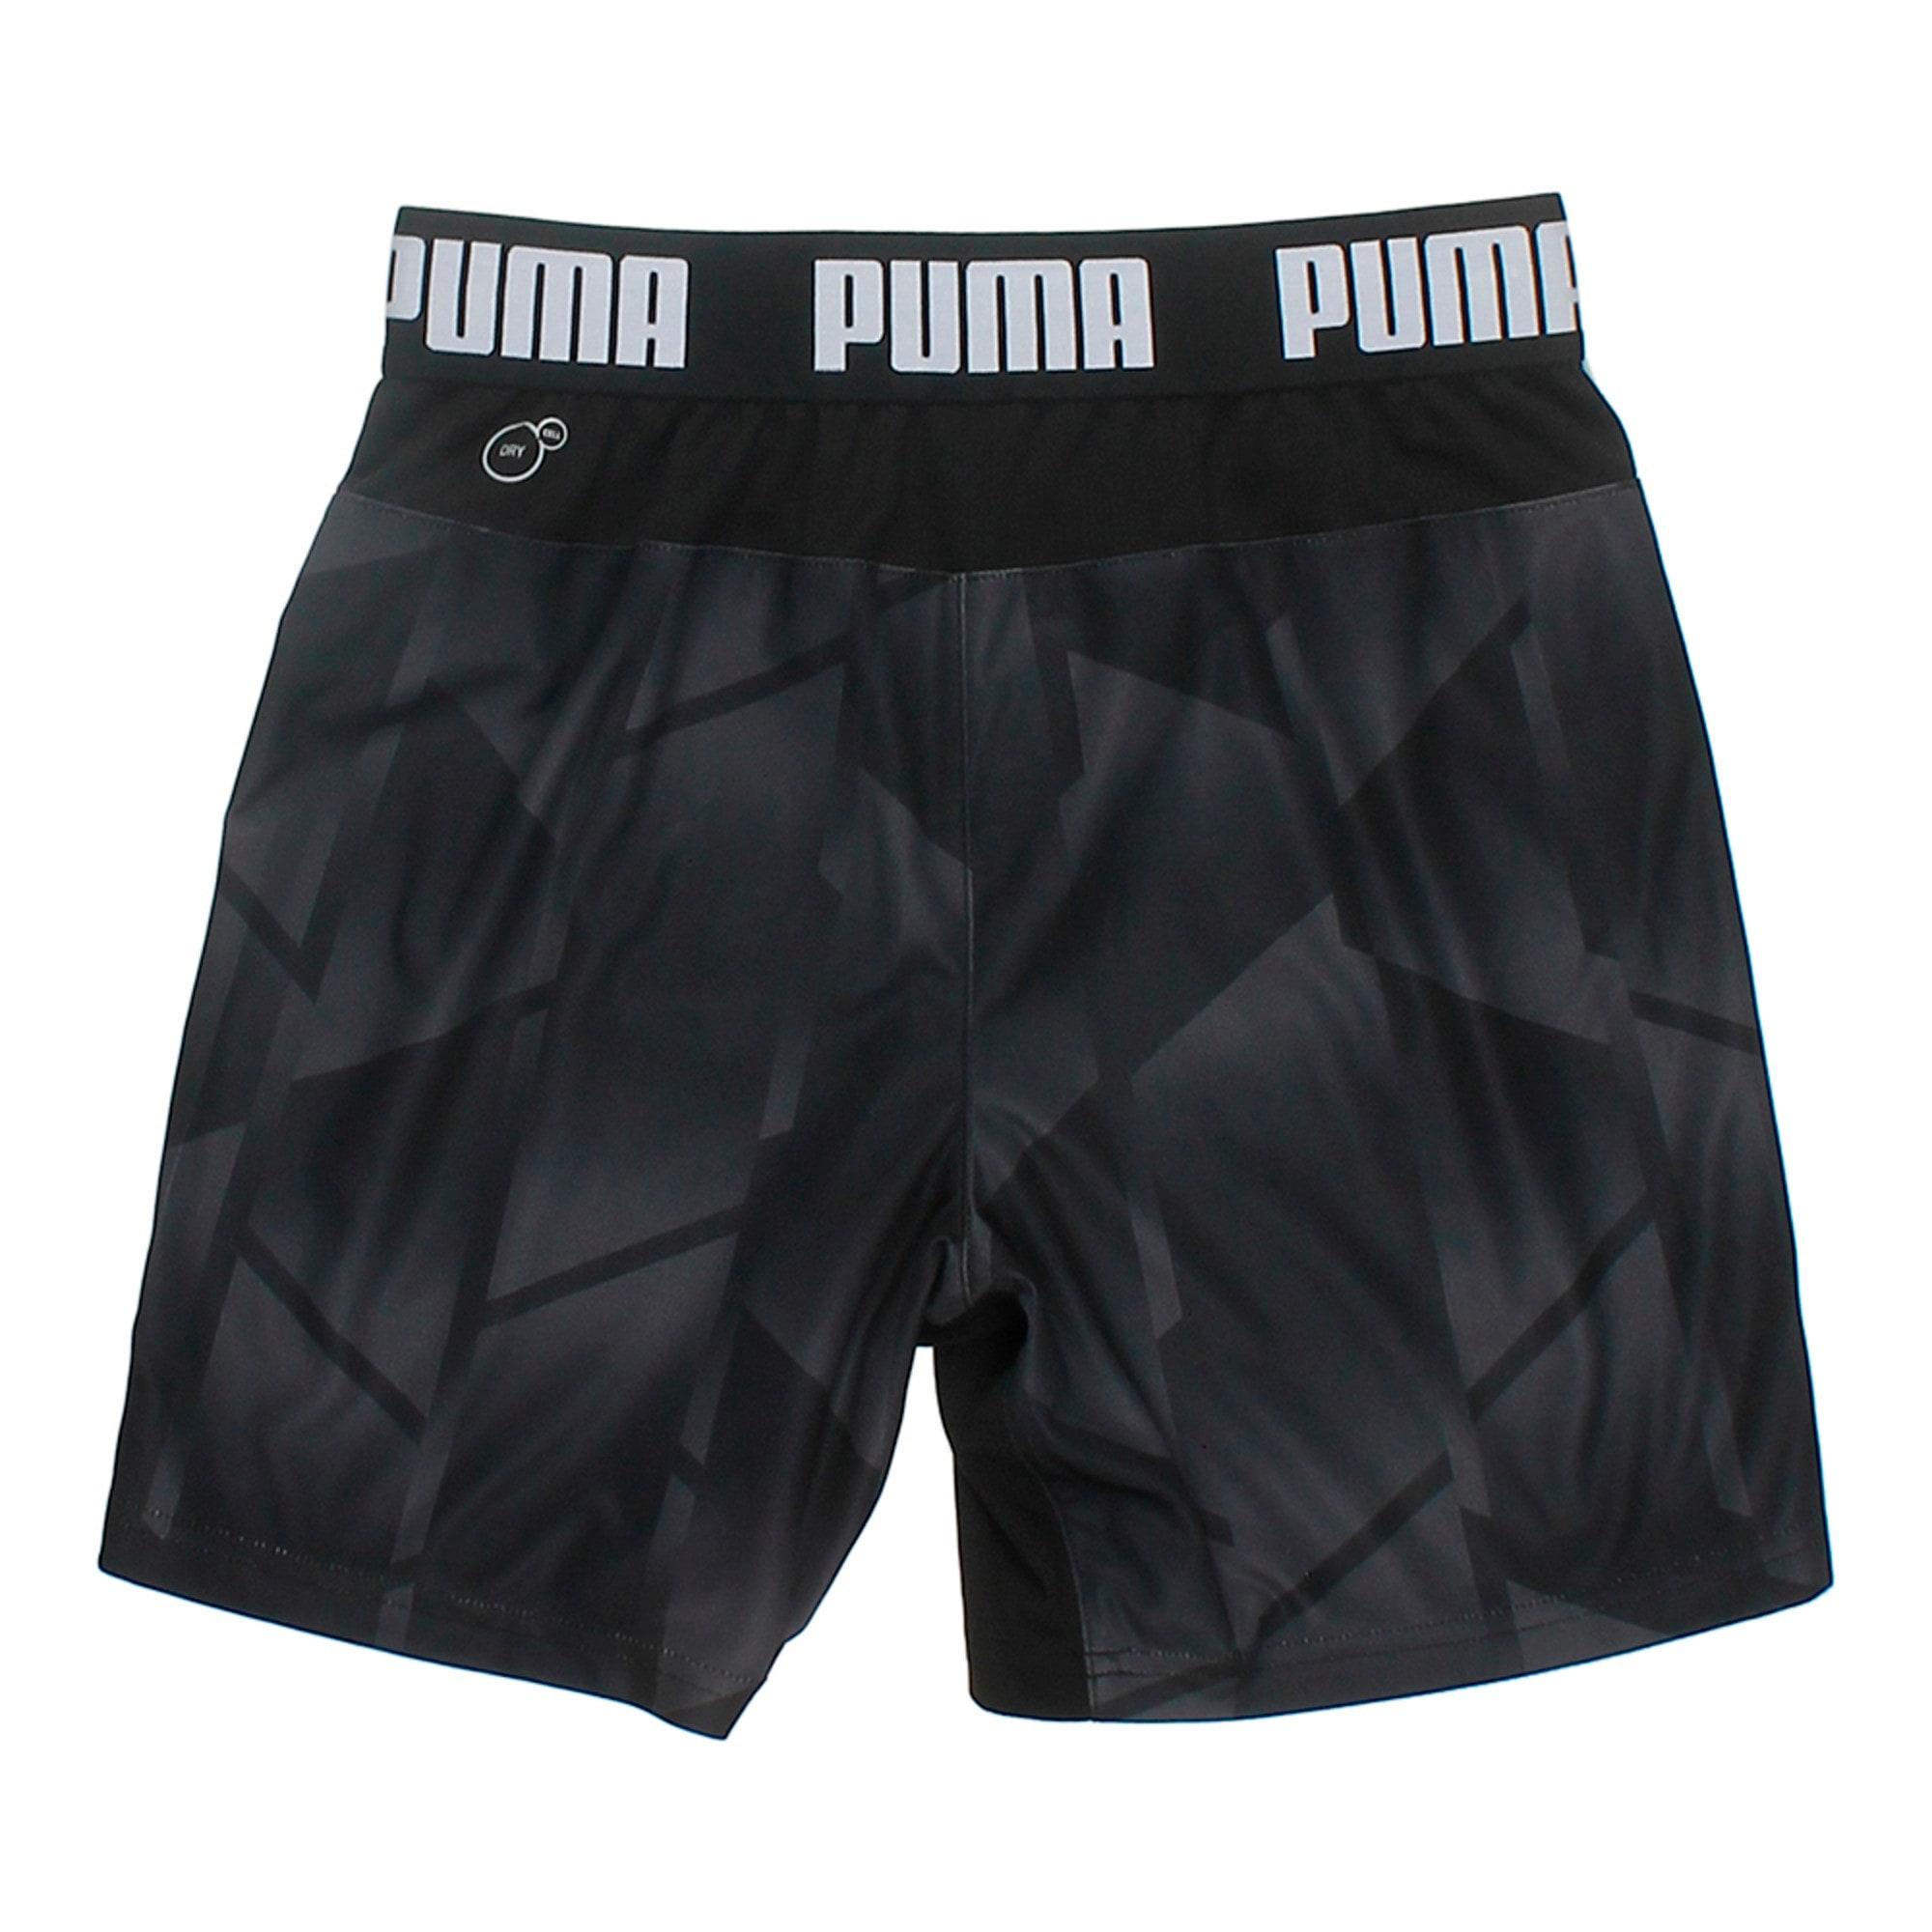 Thumbnail 3 of ftblNXT Pro Shorts Jr Puma Black, Puma Black, medium-IND